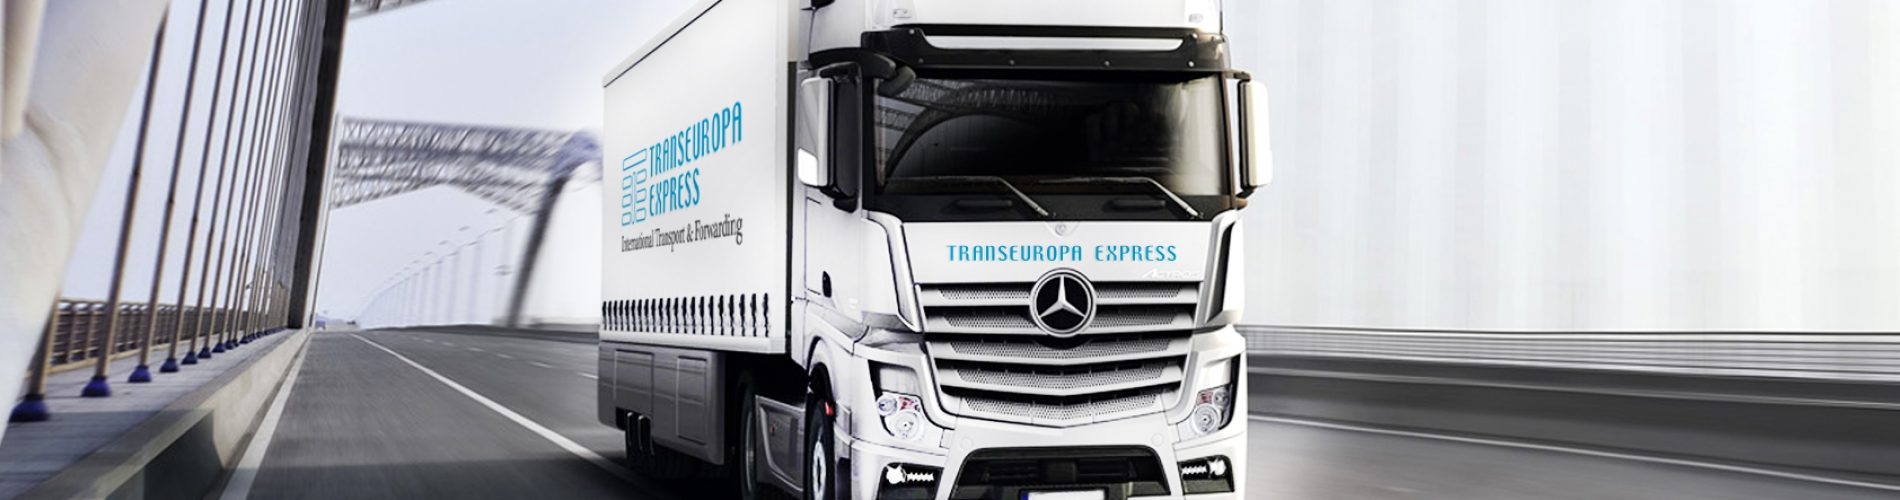 transeuropa-express-prato